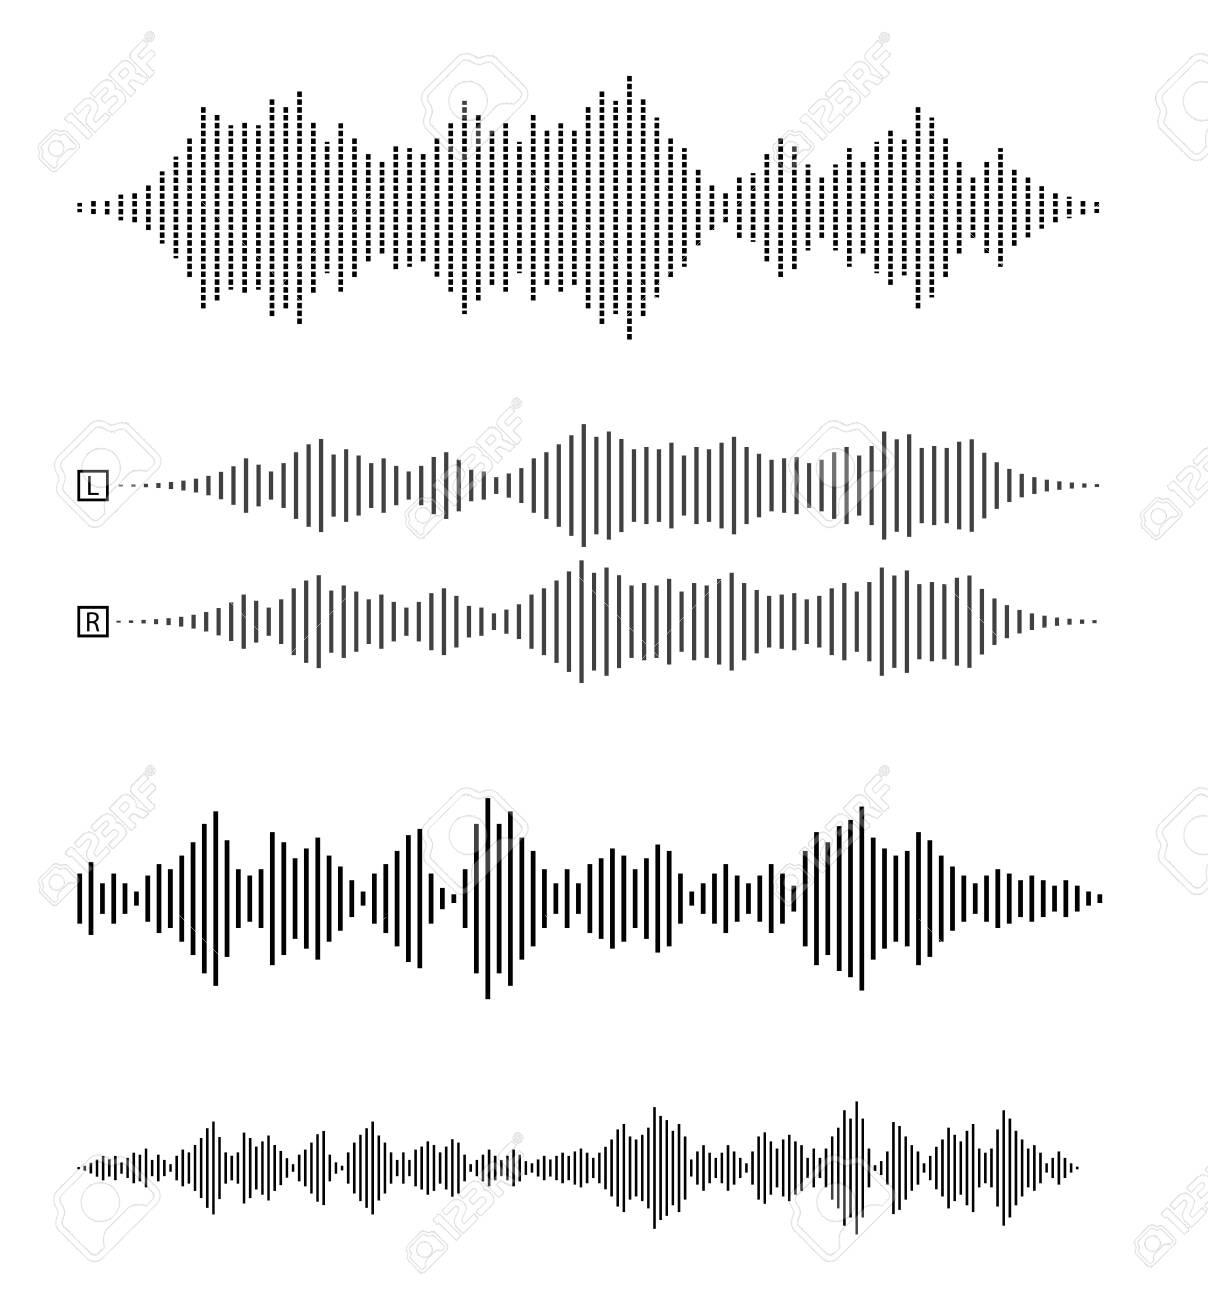 set of audio waveforms or sound waves, speech, noise or music symbol vector illustration - 150937549